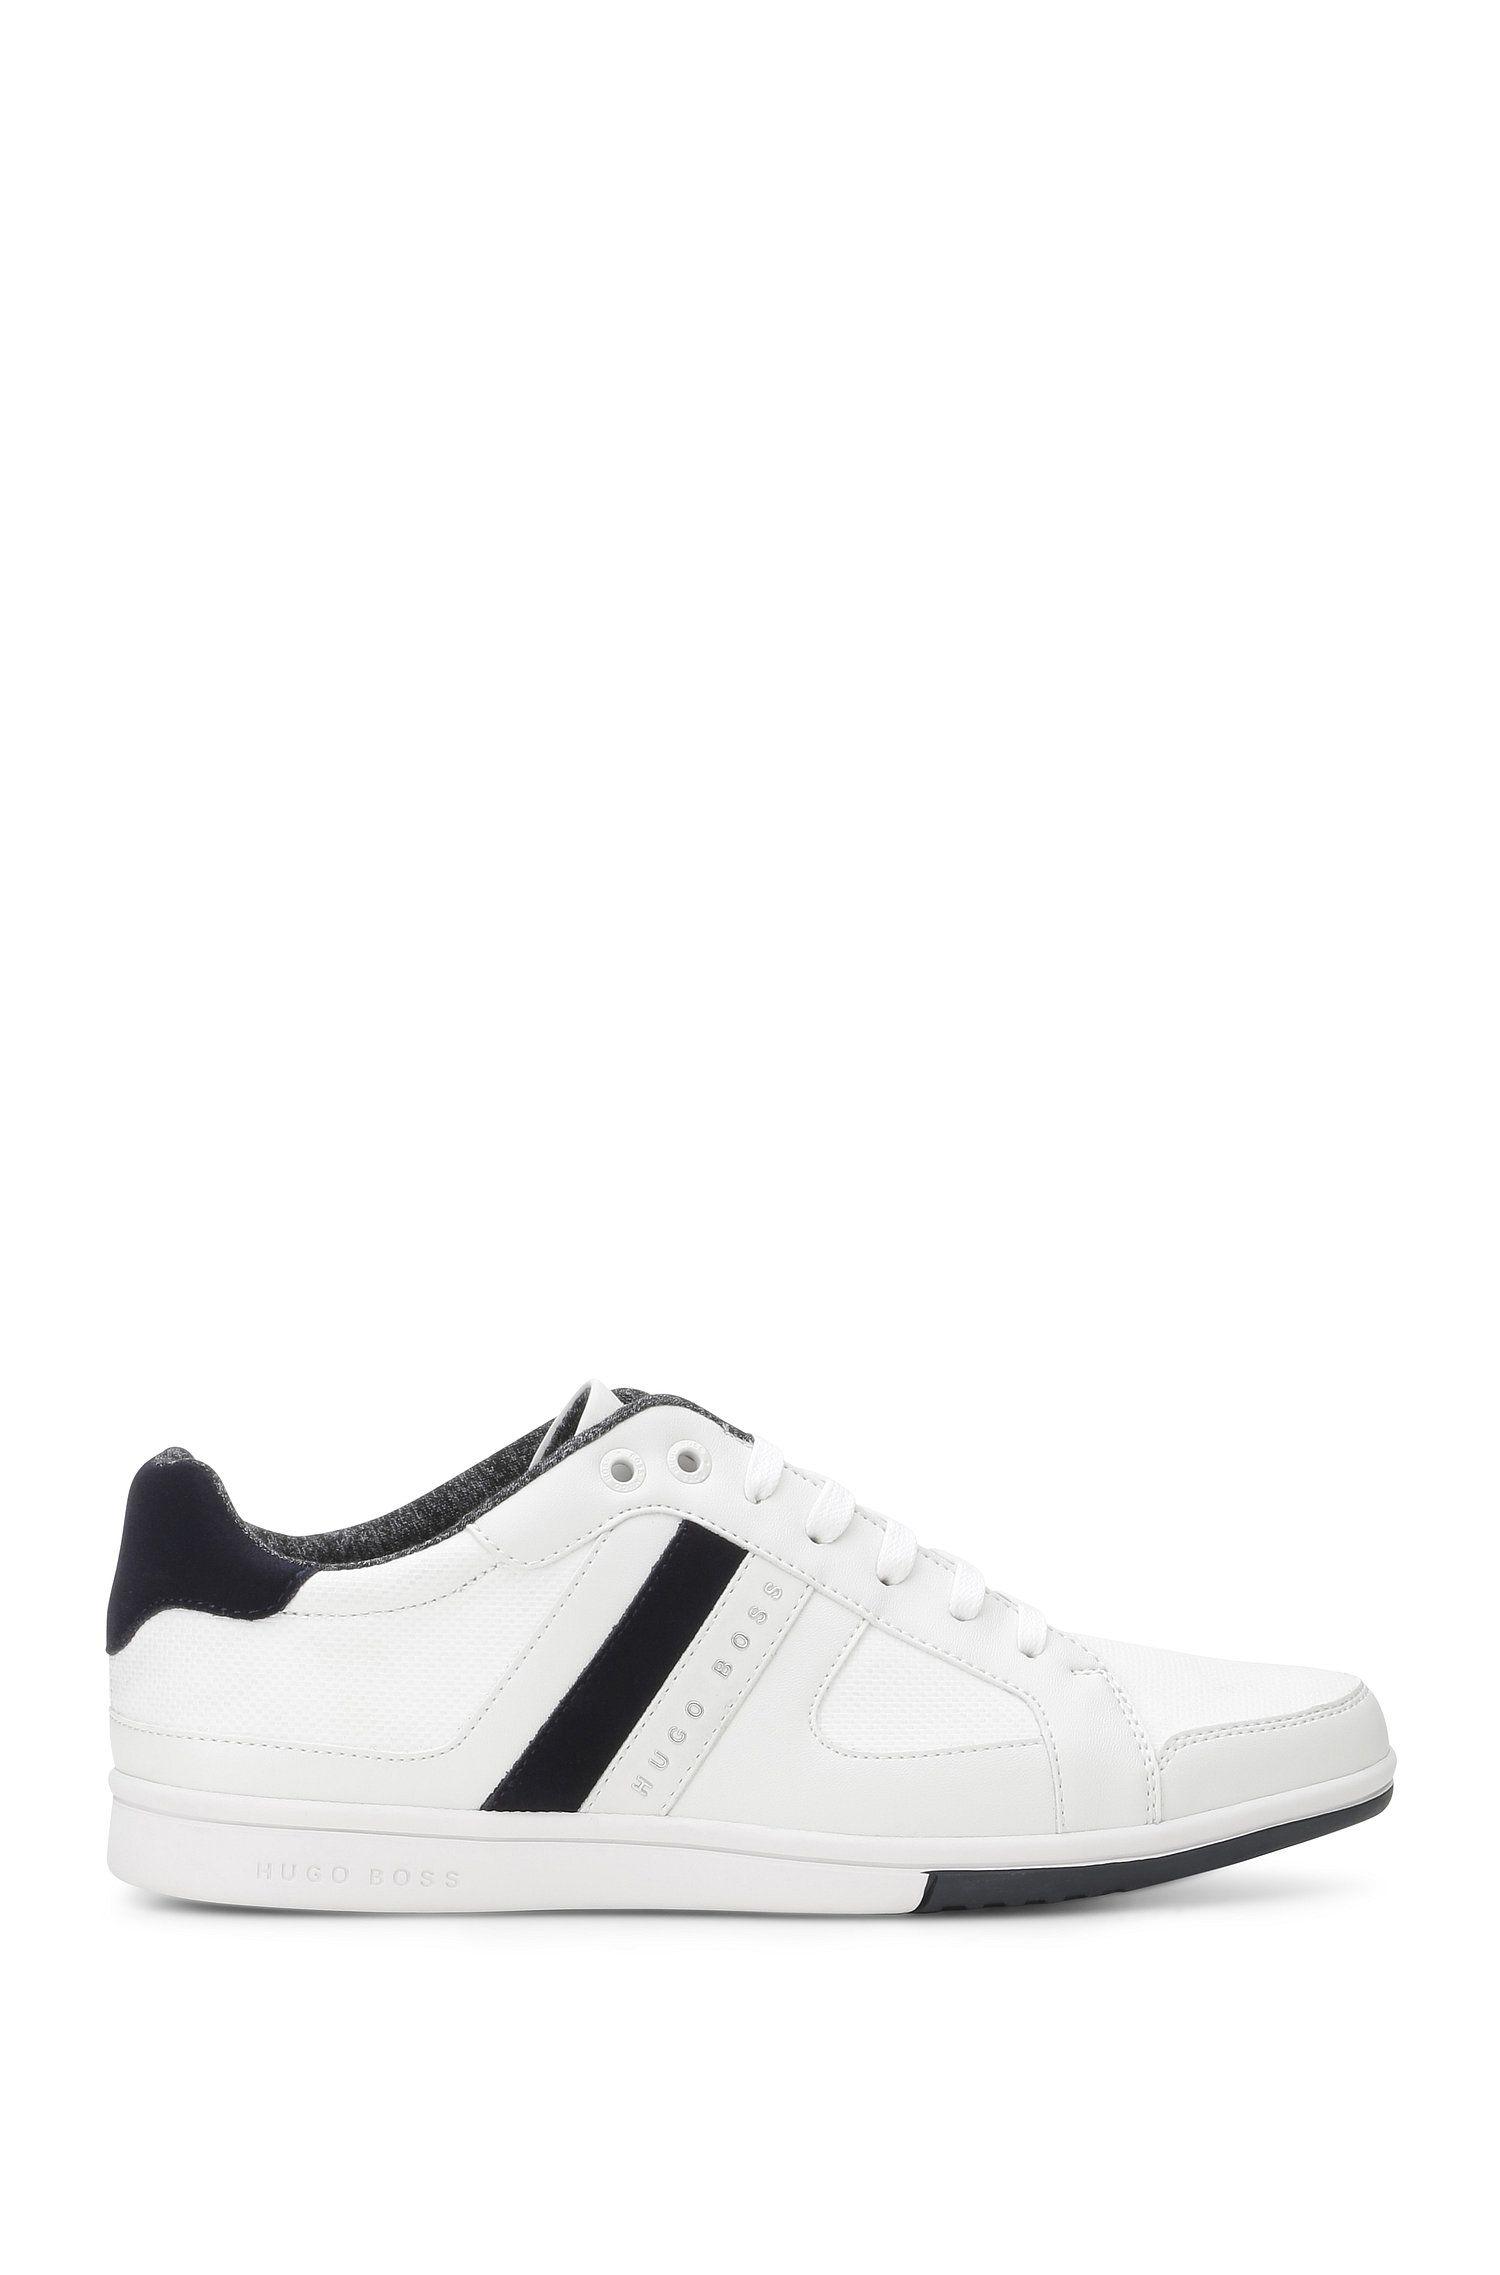 Coated Mesh Sneaker | Metro Tenn Cvc